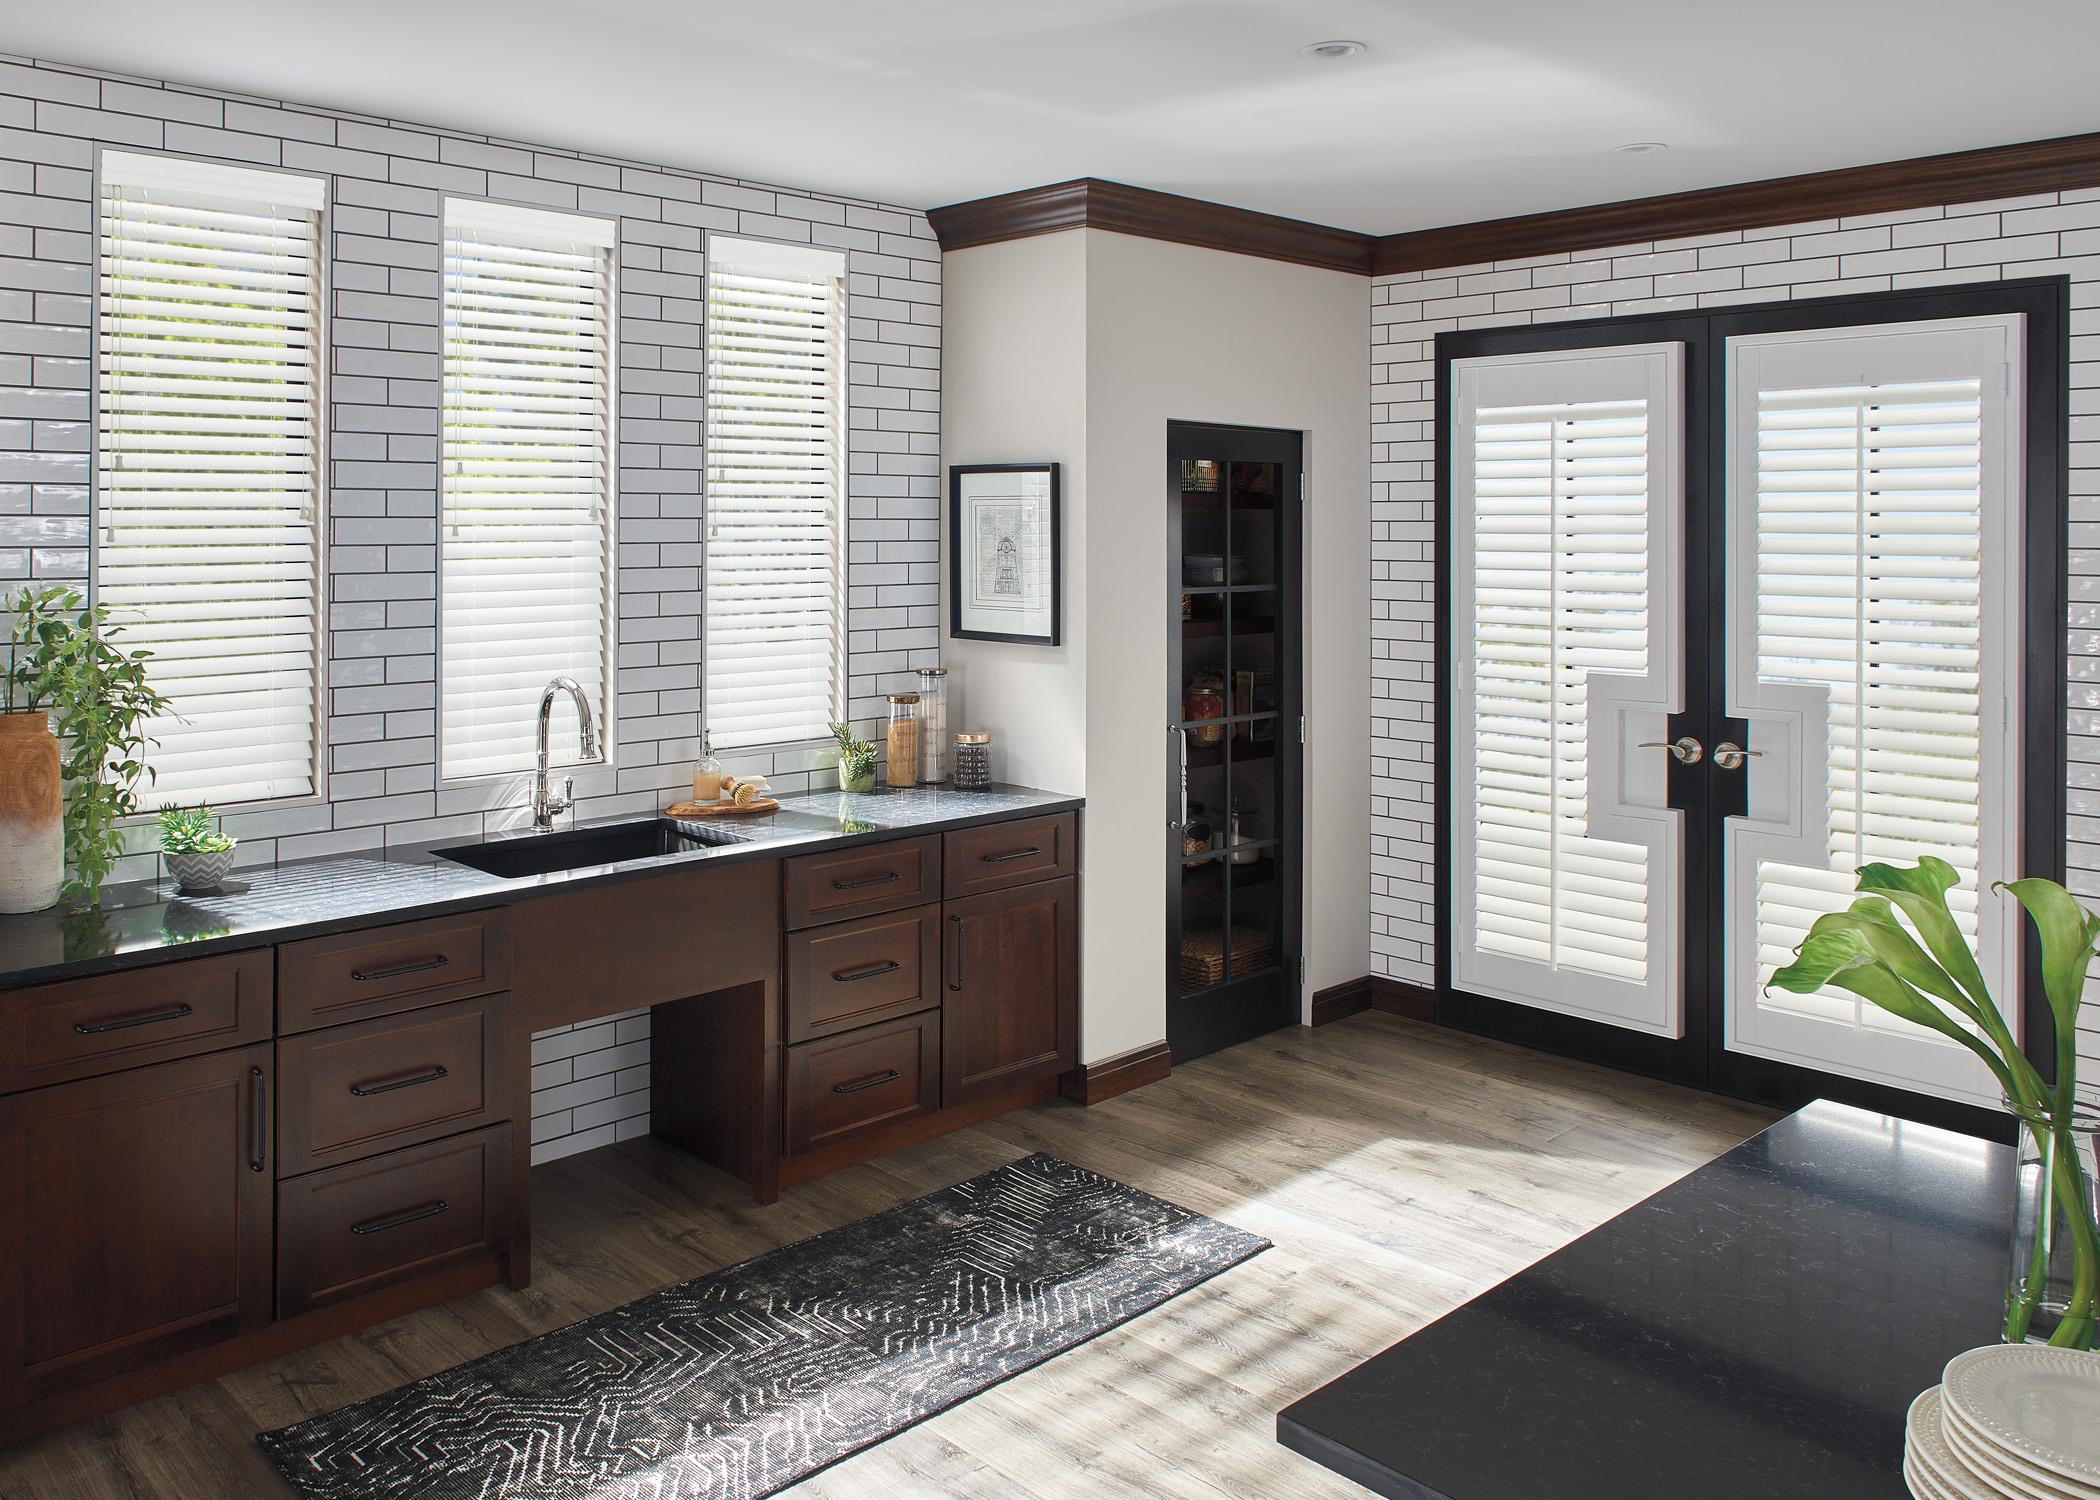 Graber_Composite Shutters_Kitchen3